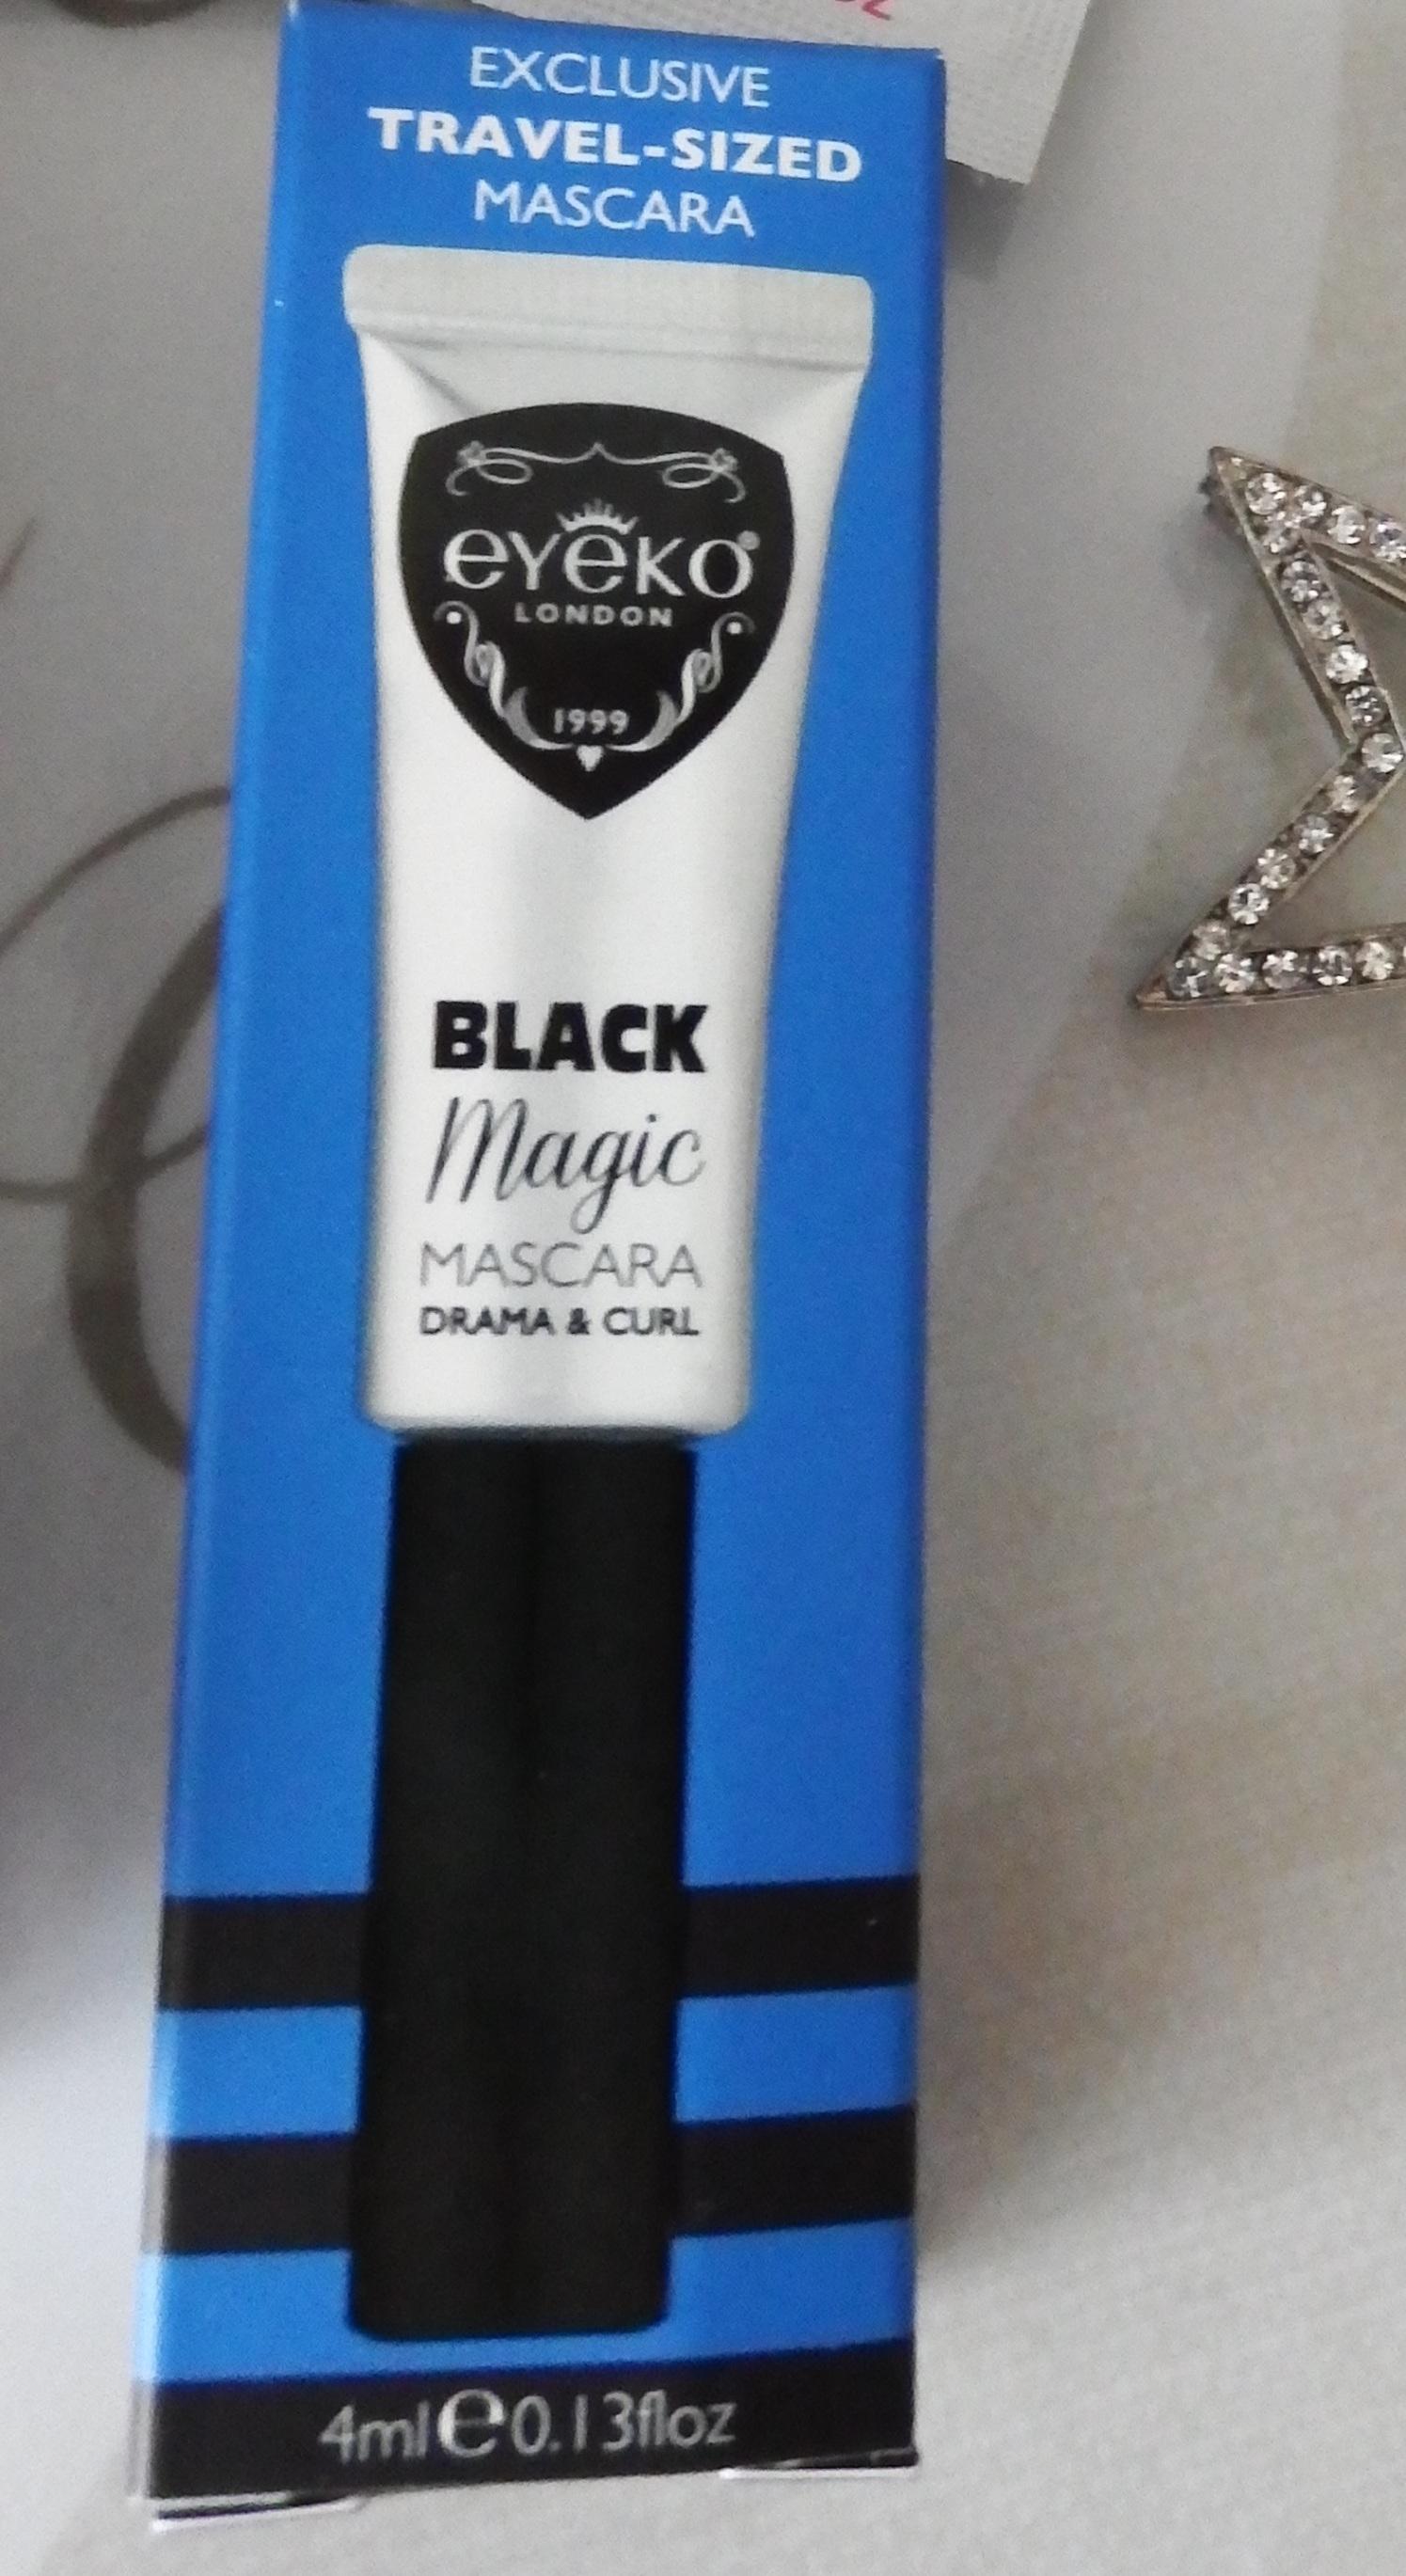 Eyeko Black Magic Mascara - Drama & Curl